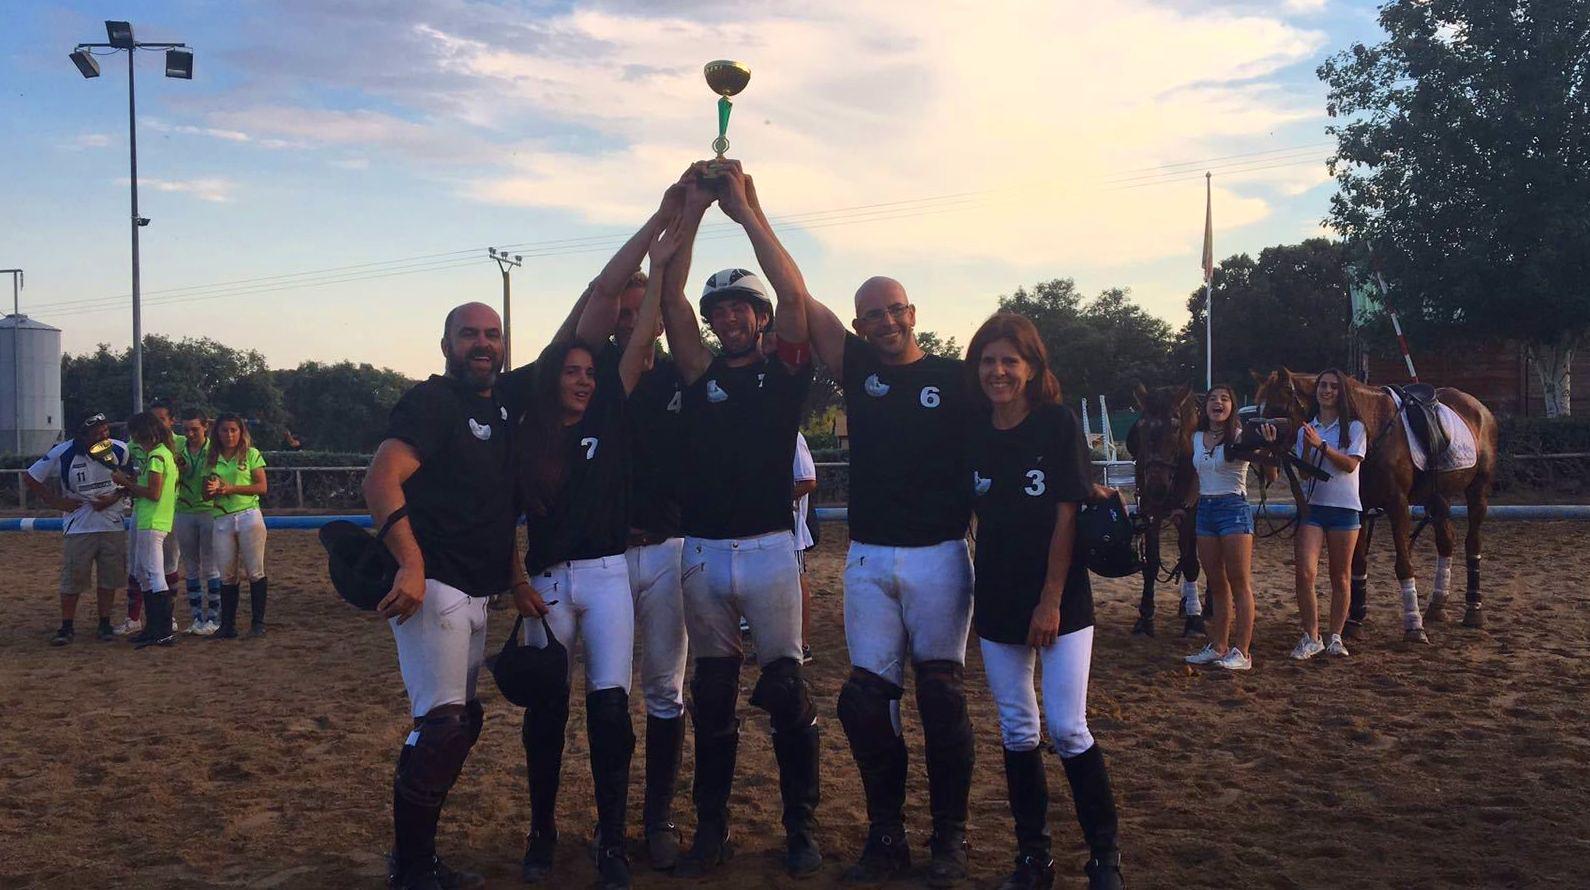 Campeones de liga de horseball